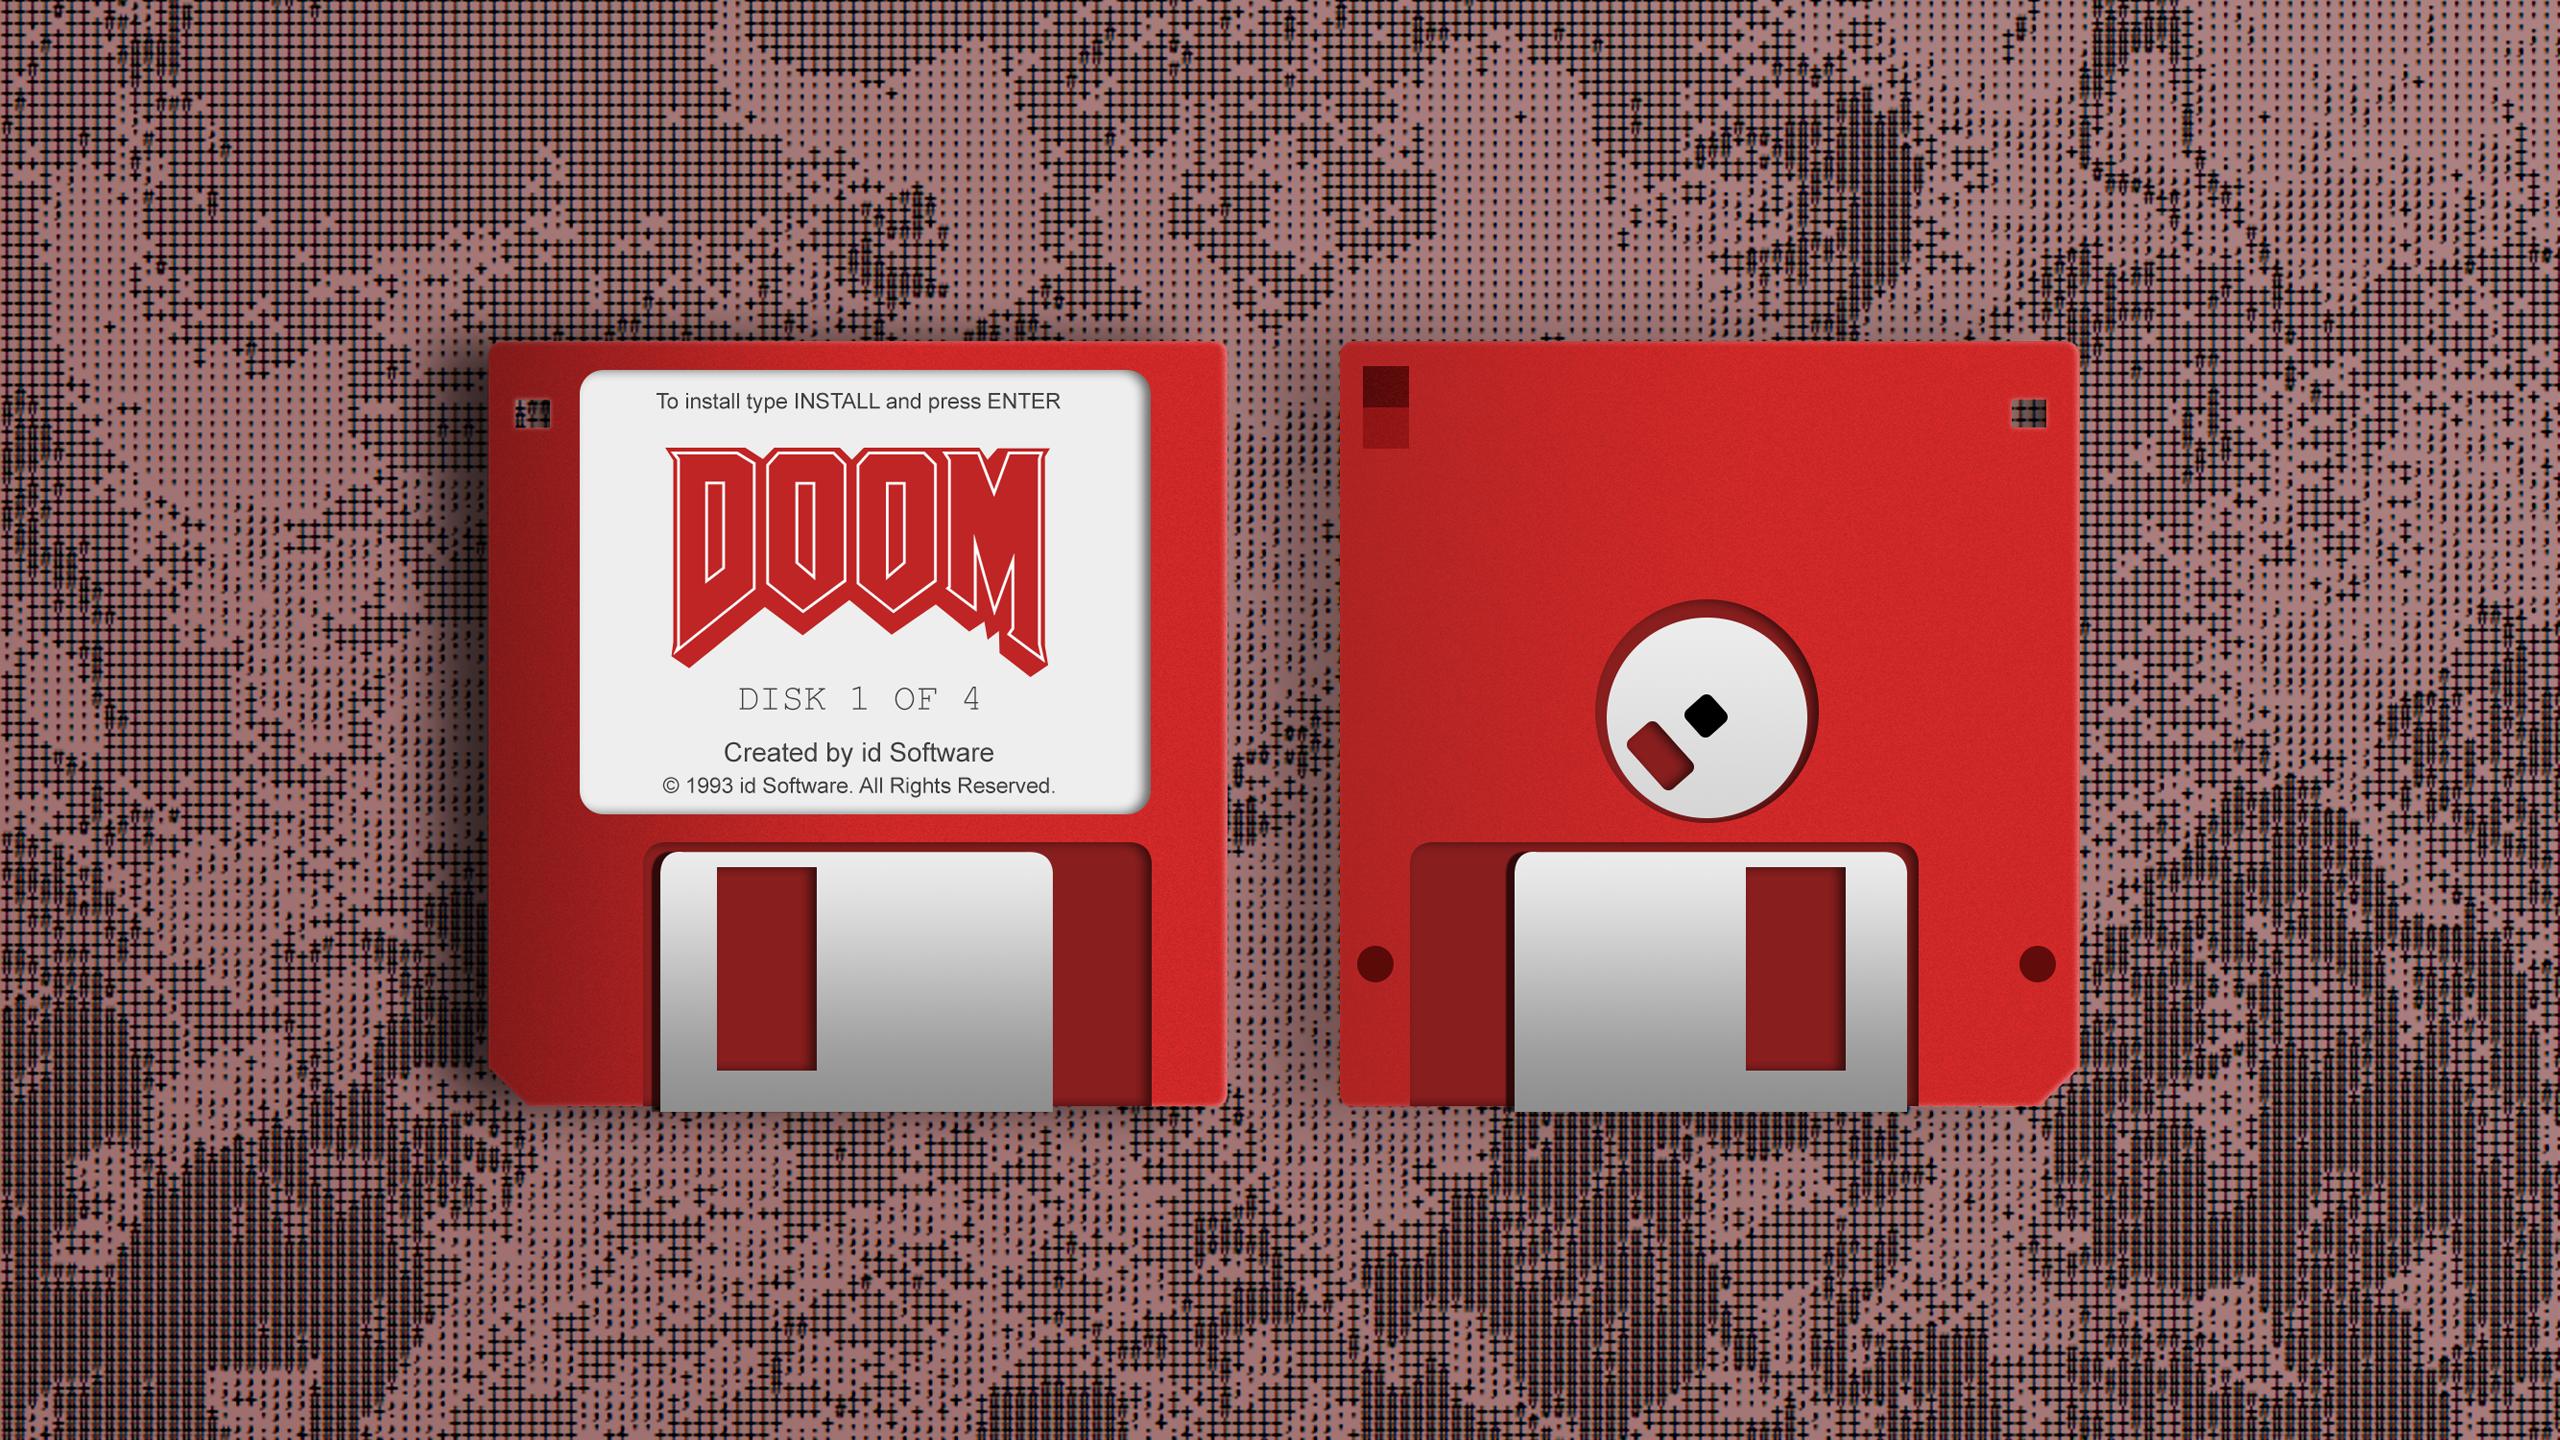 Floppy Doom 2560x1440 Oc Doom Floppy Disk R Wallpaper